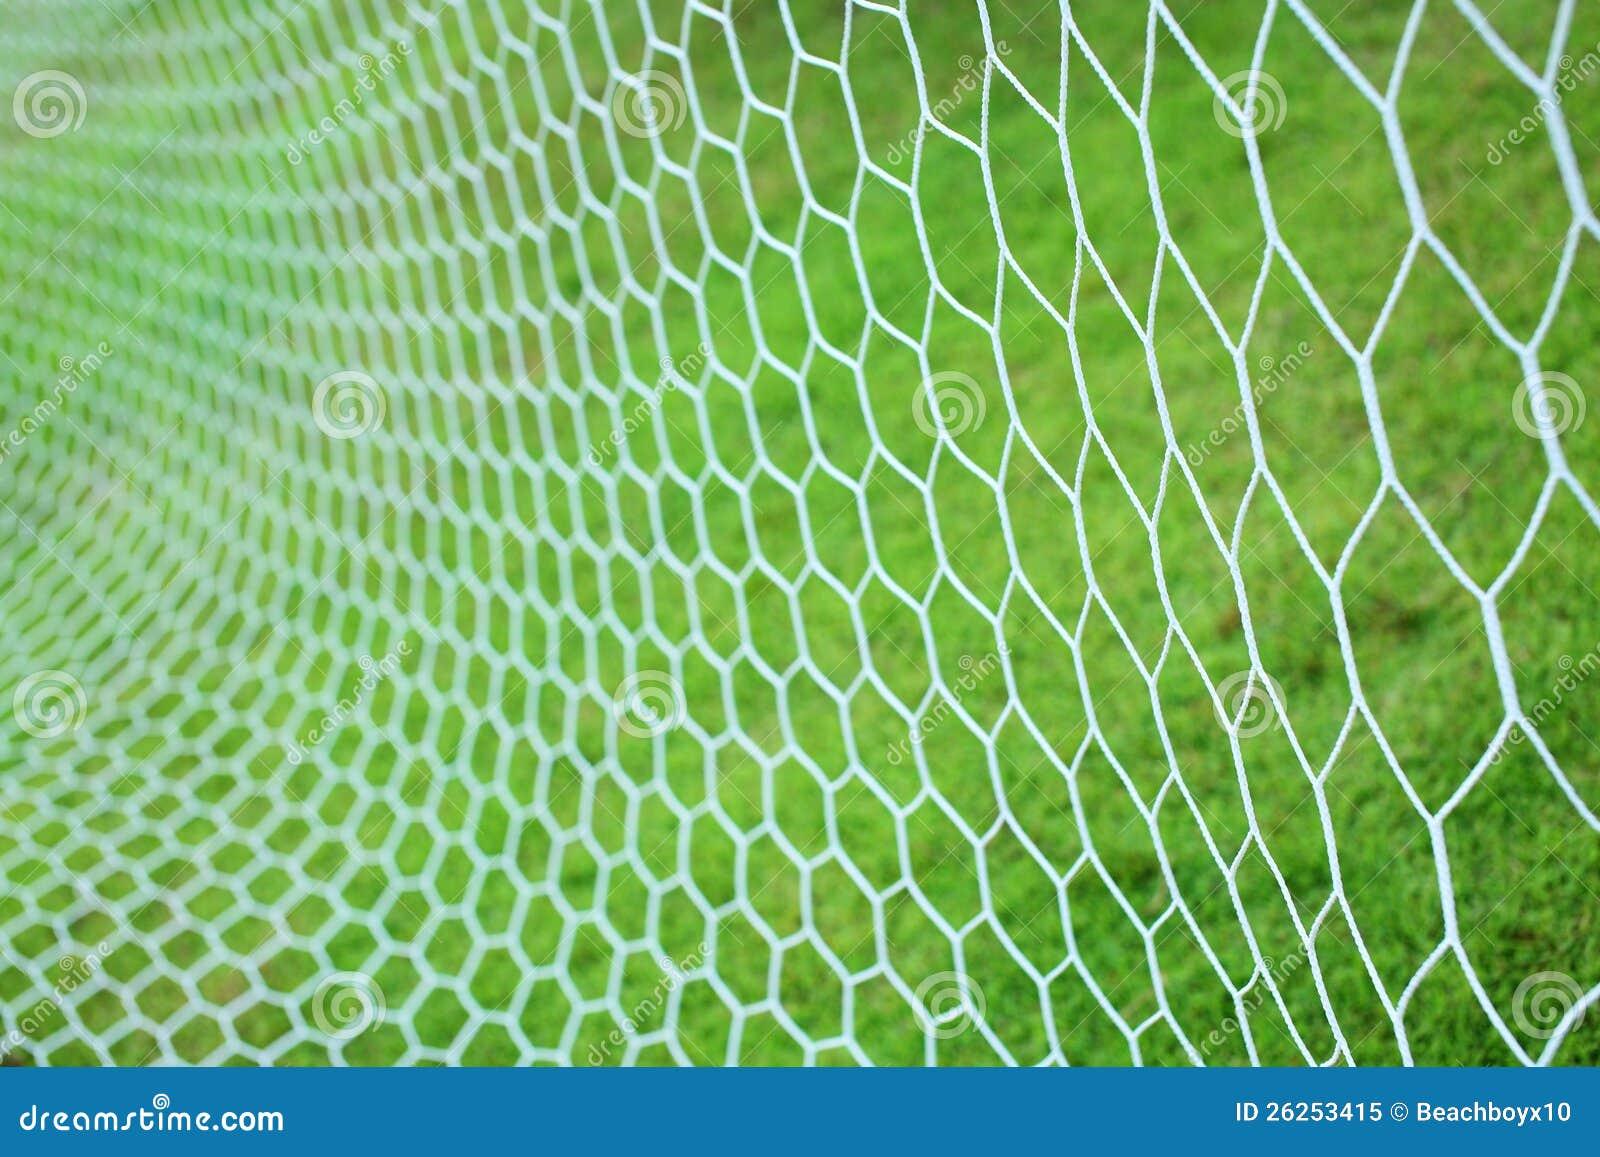 Soccer goal net stock image. Image of stadium, symbol ...